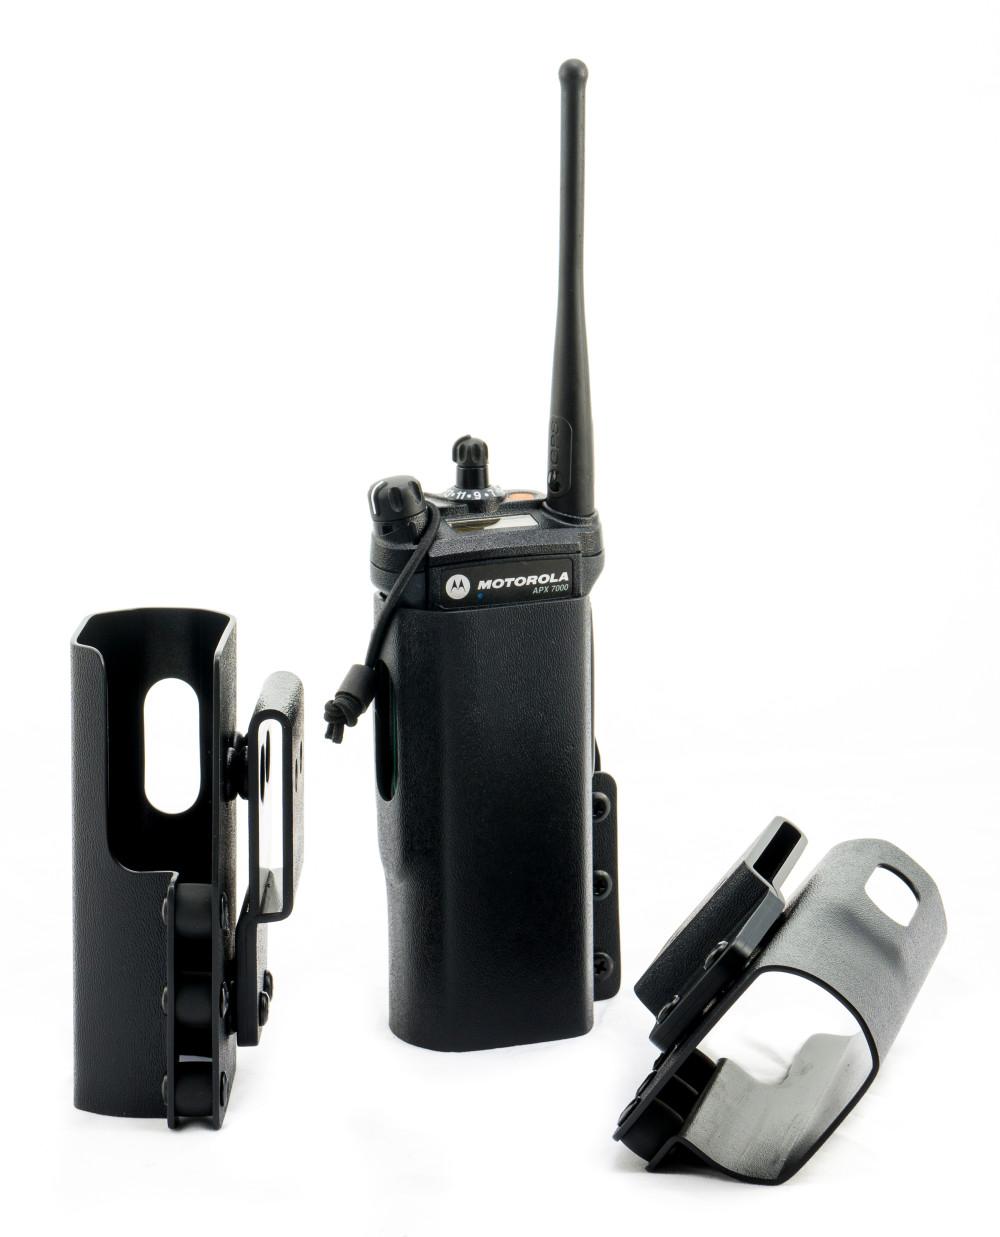 Radio holder motorola apx 6000 - Motorola Apx 7000